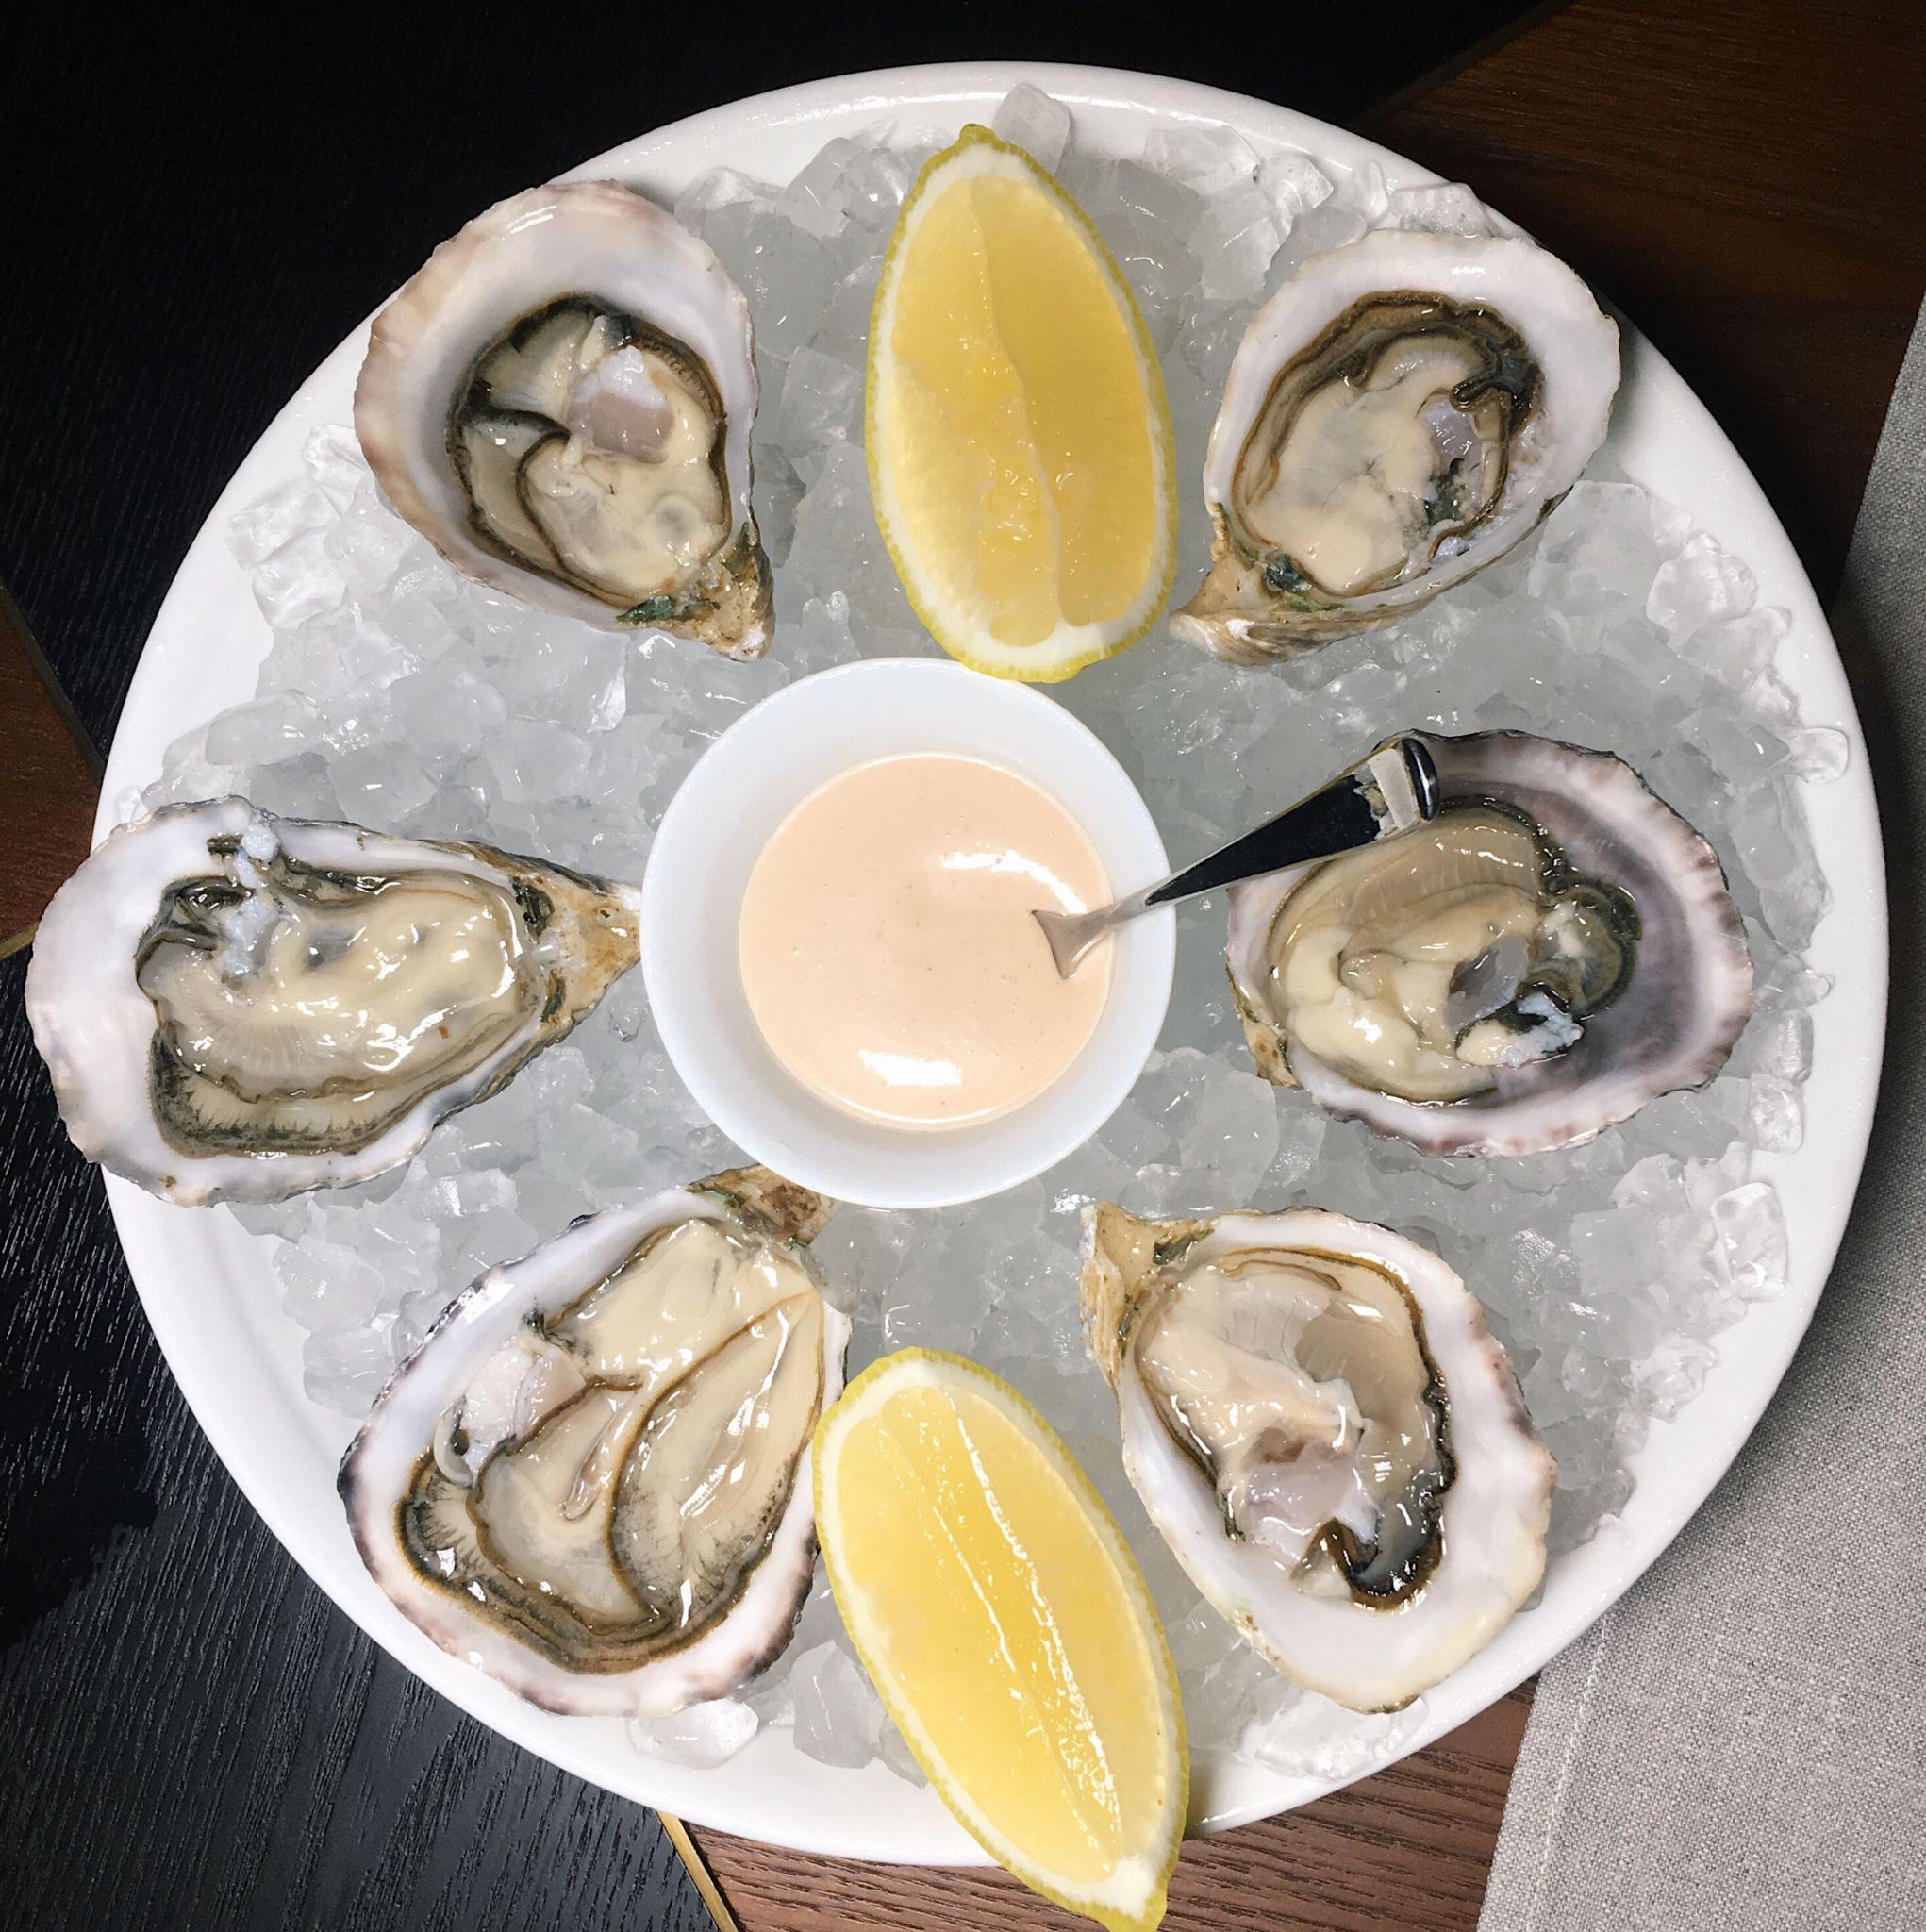 British Columbia Oysters - Origin Grill & Bar